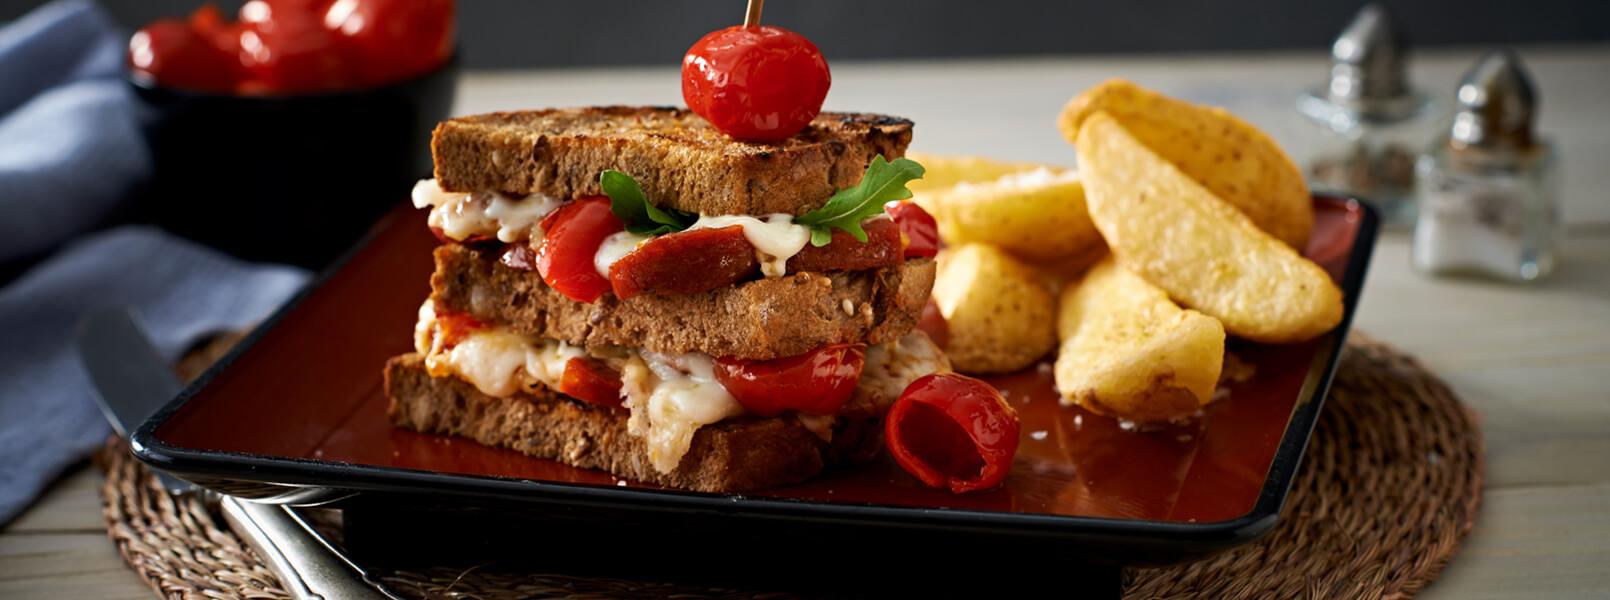 4 Home Banner Sandwich 1610x600